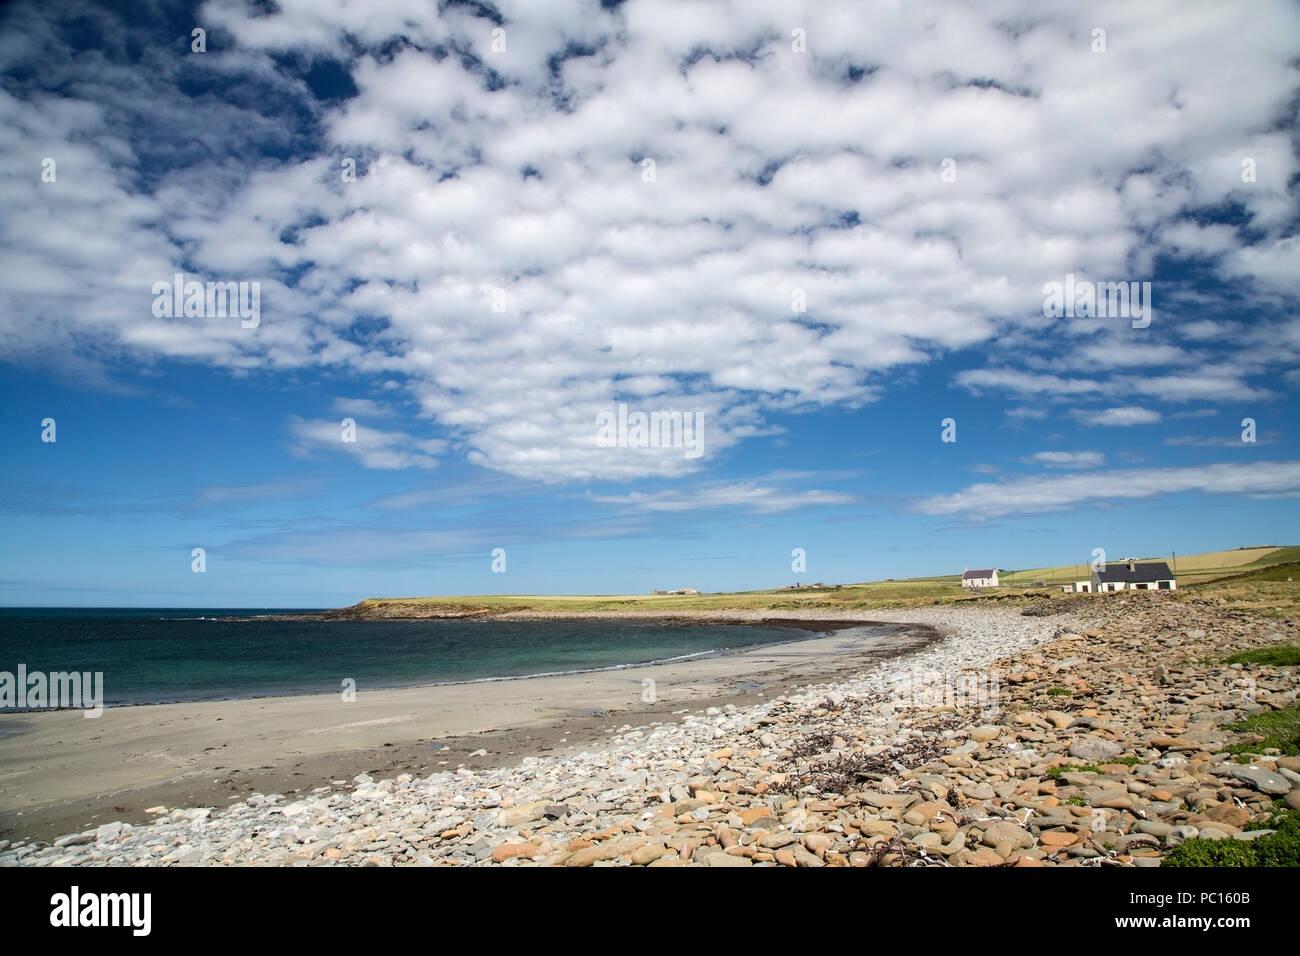 view of beach near Kirkwall, Orkney islands, Scotland - Stock Image